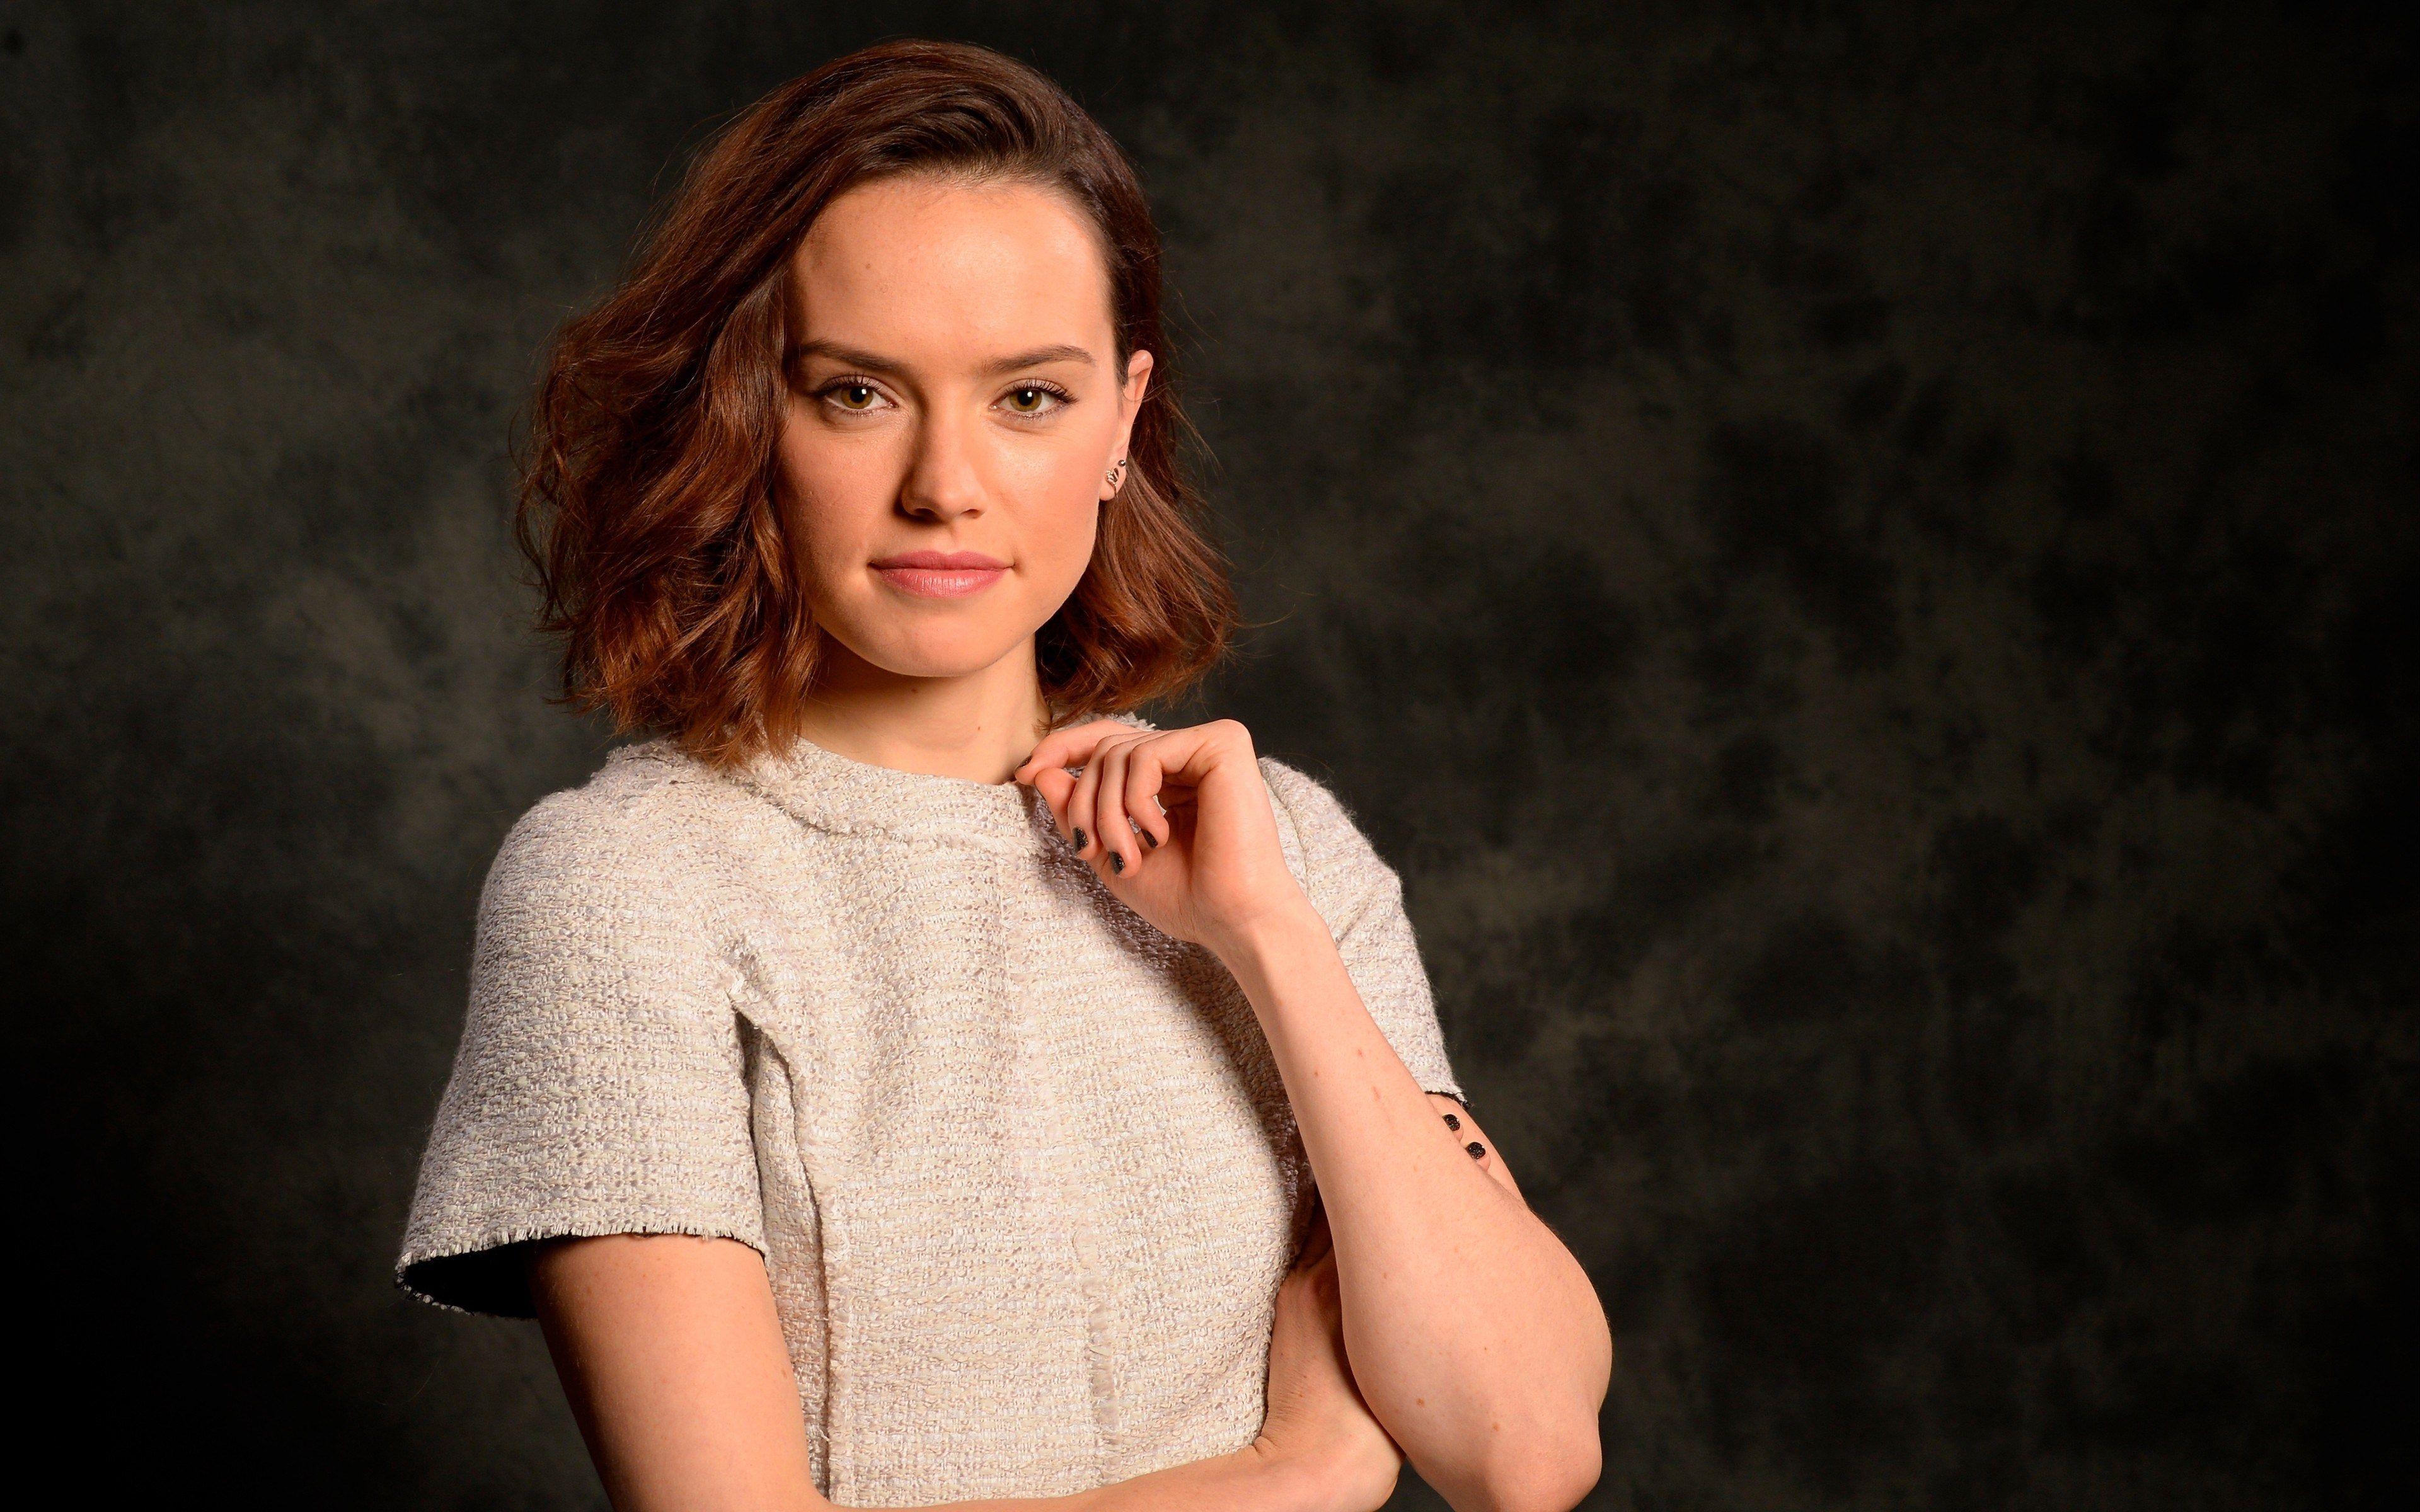 3840x2400 Daisy Ridley 4k Wallpaper Best Daisy Ridley Daisy Ridley Star Wars Actresses